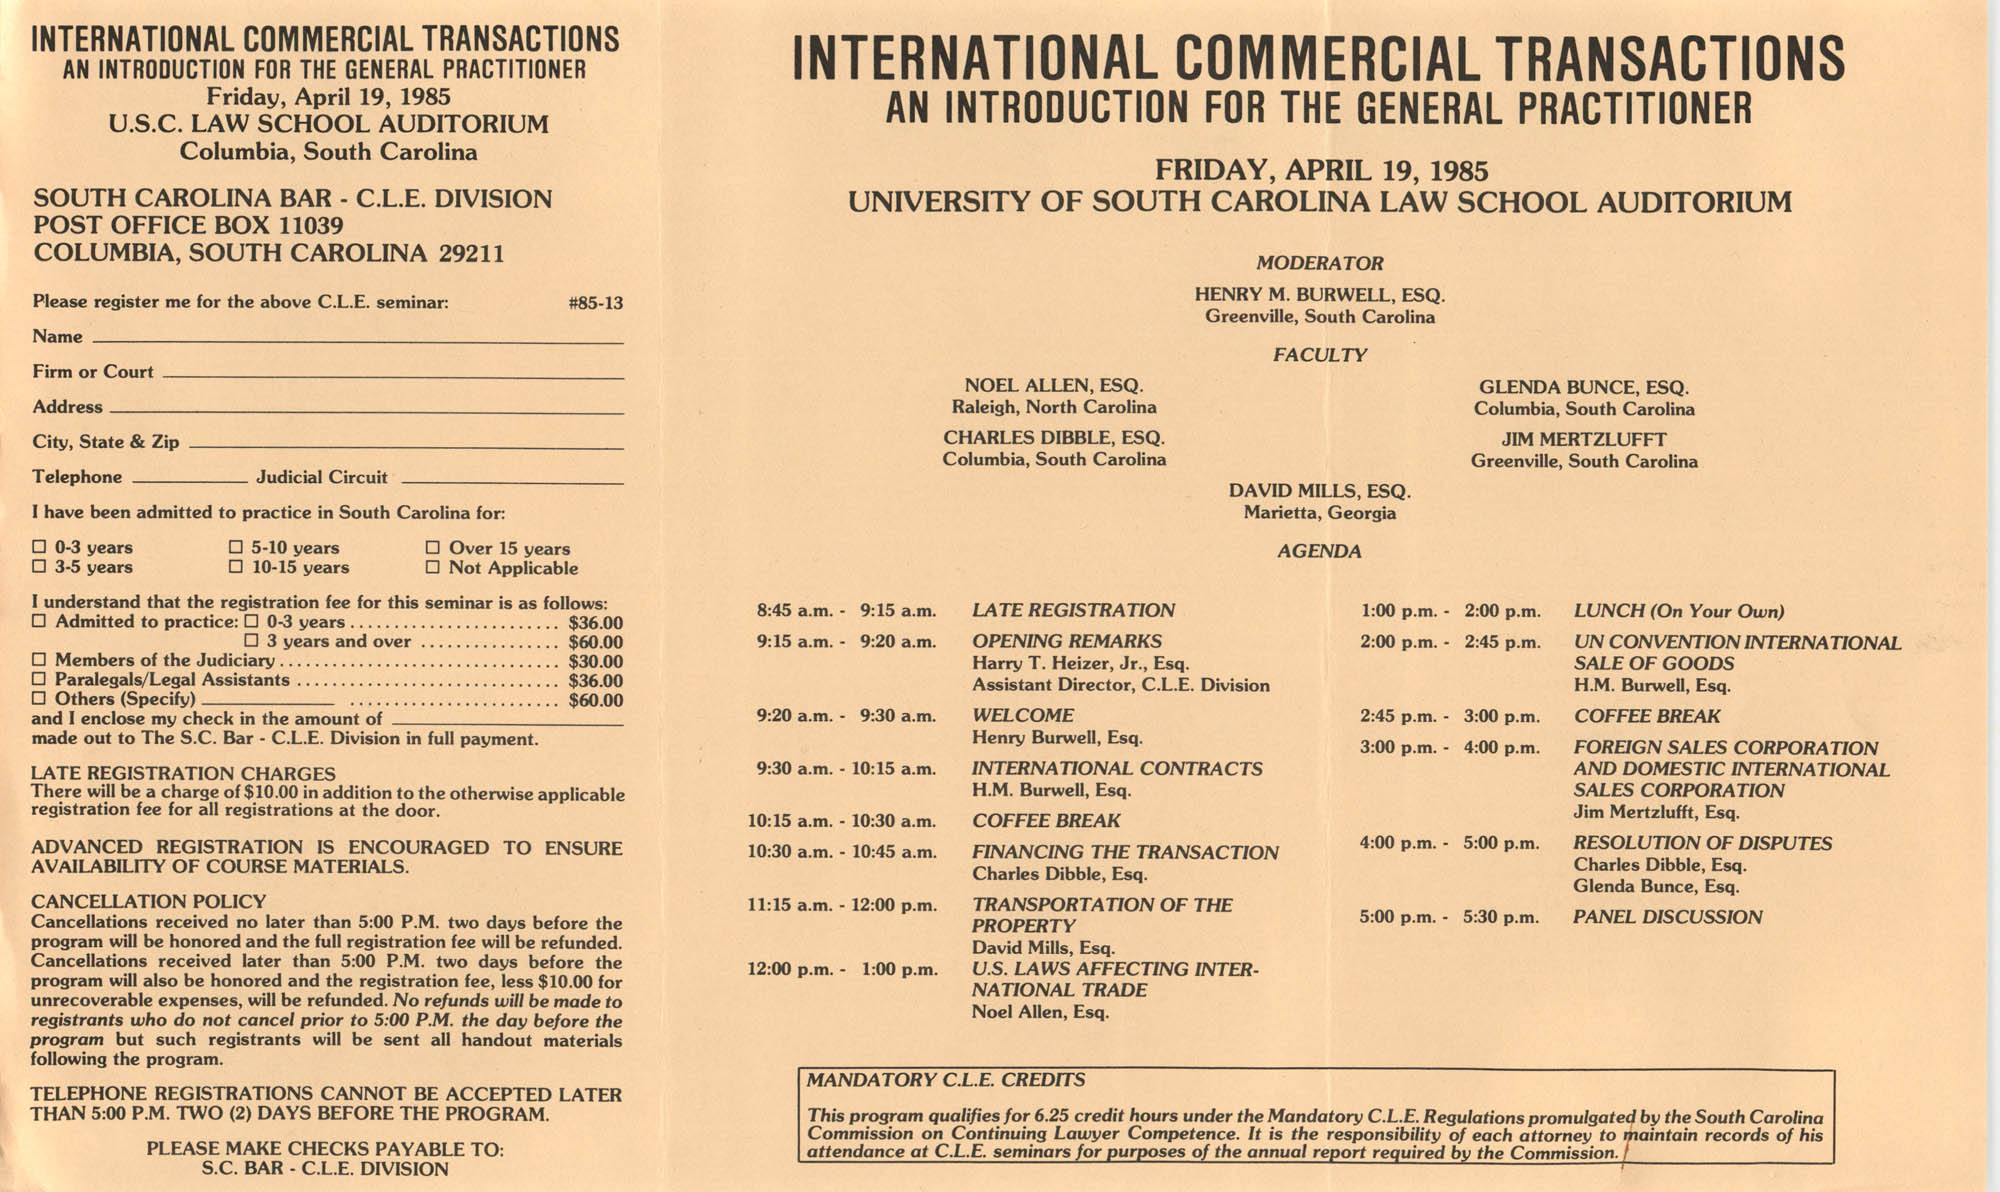 International Commercial Transactions, Continuing Legal Education Seminar Pamphlet, April 19, 1985